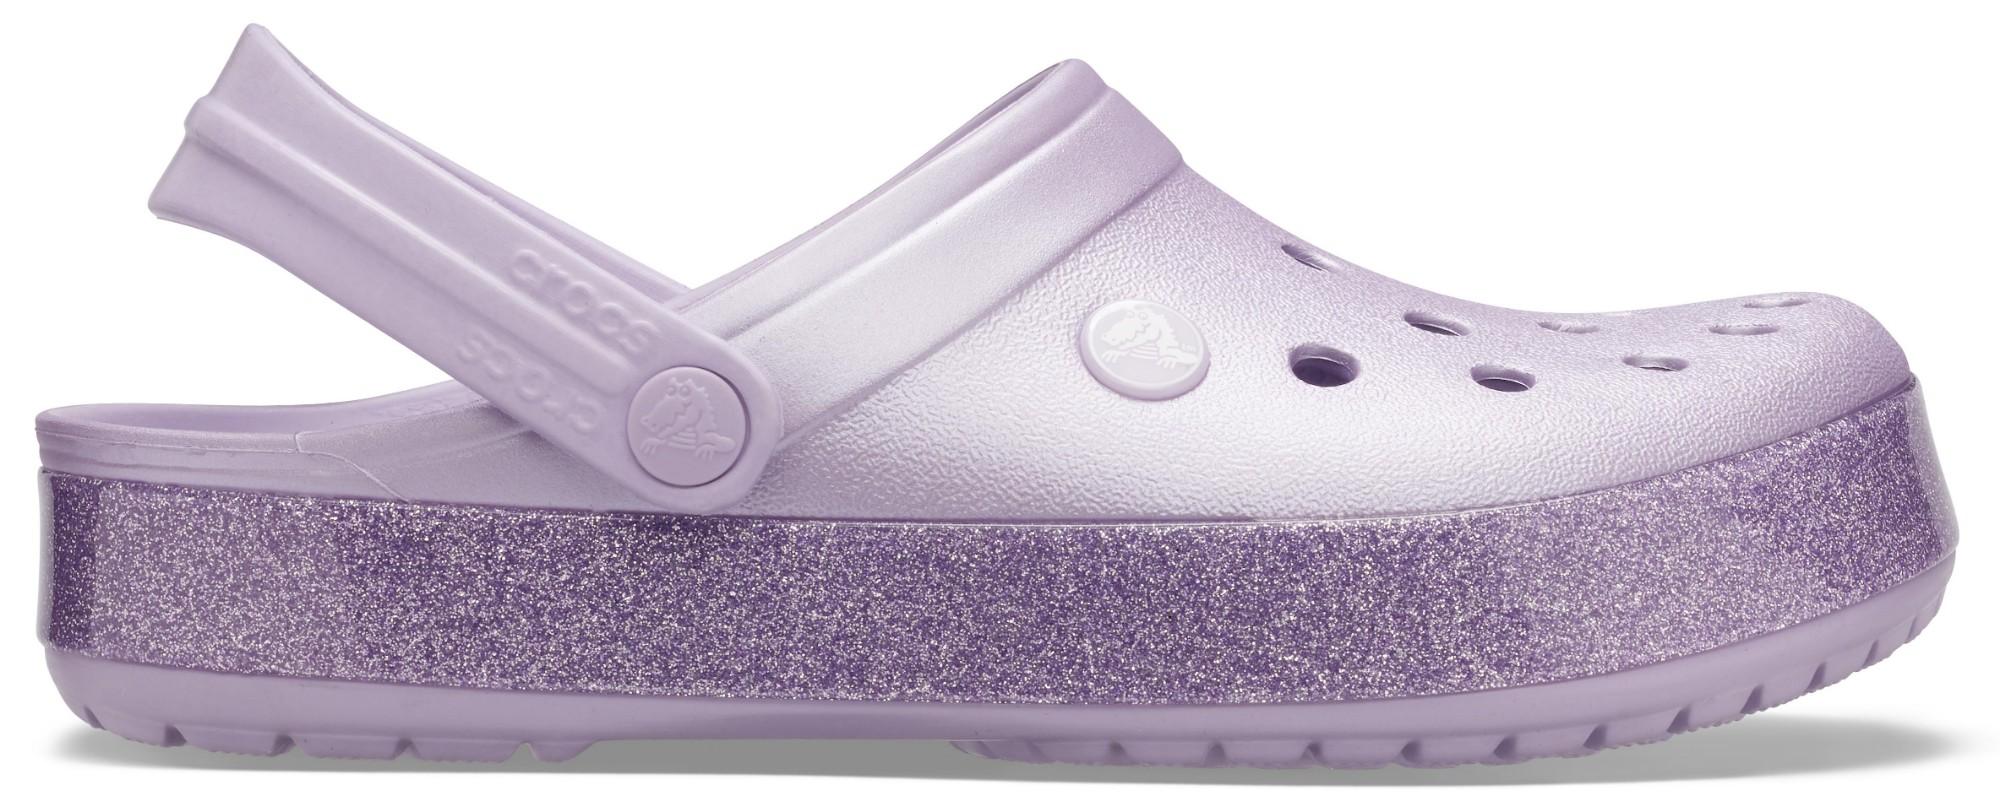 Crocs™ Crocband Printed Clog Metallic Lavender 38,5